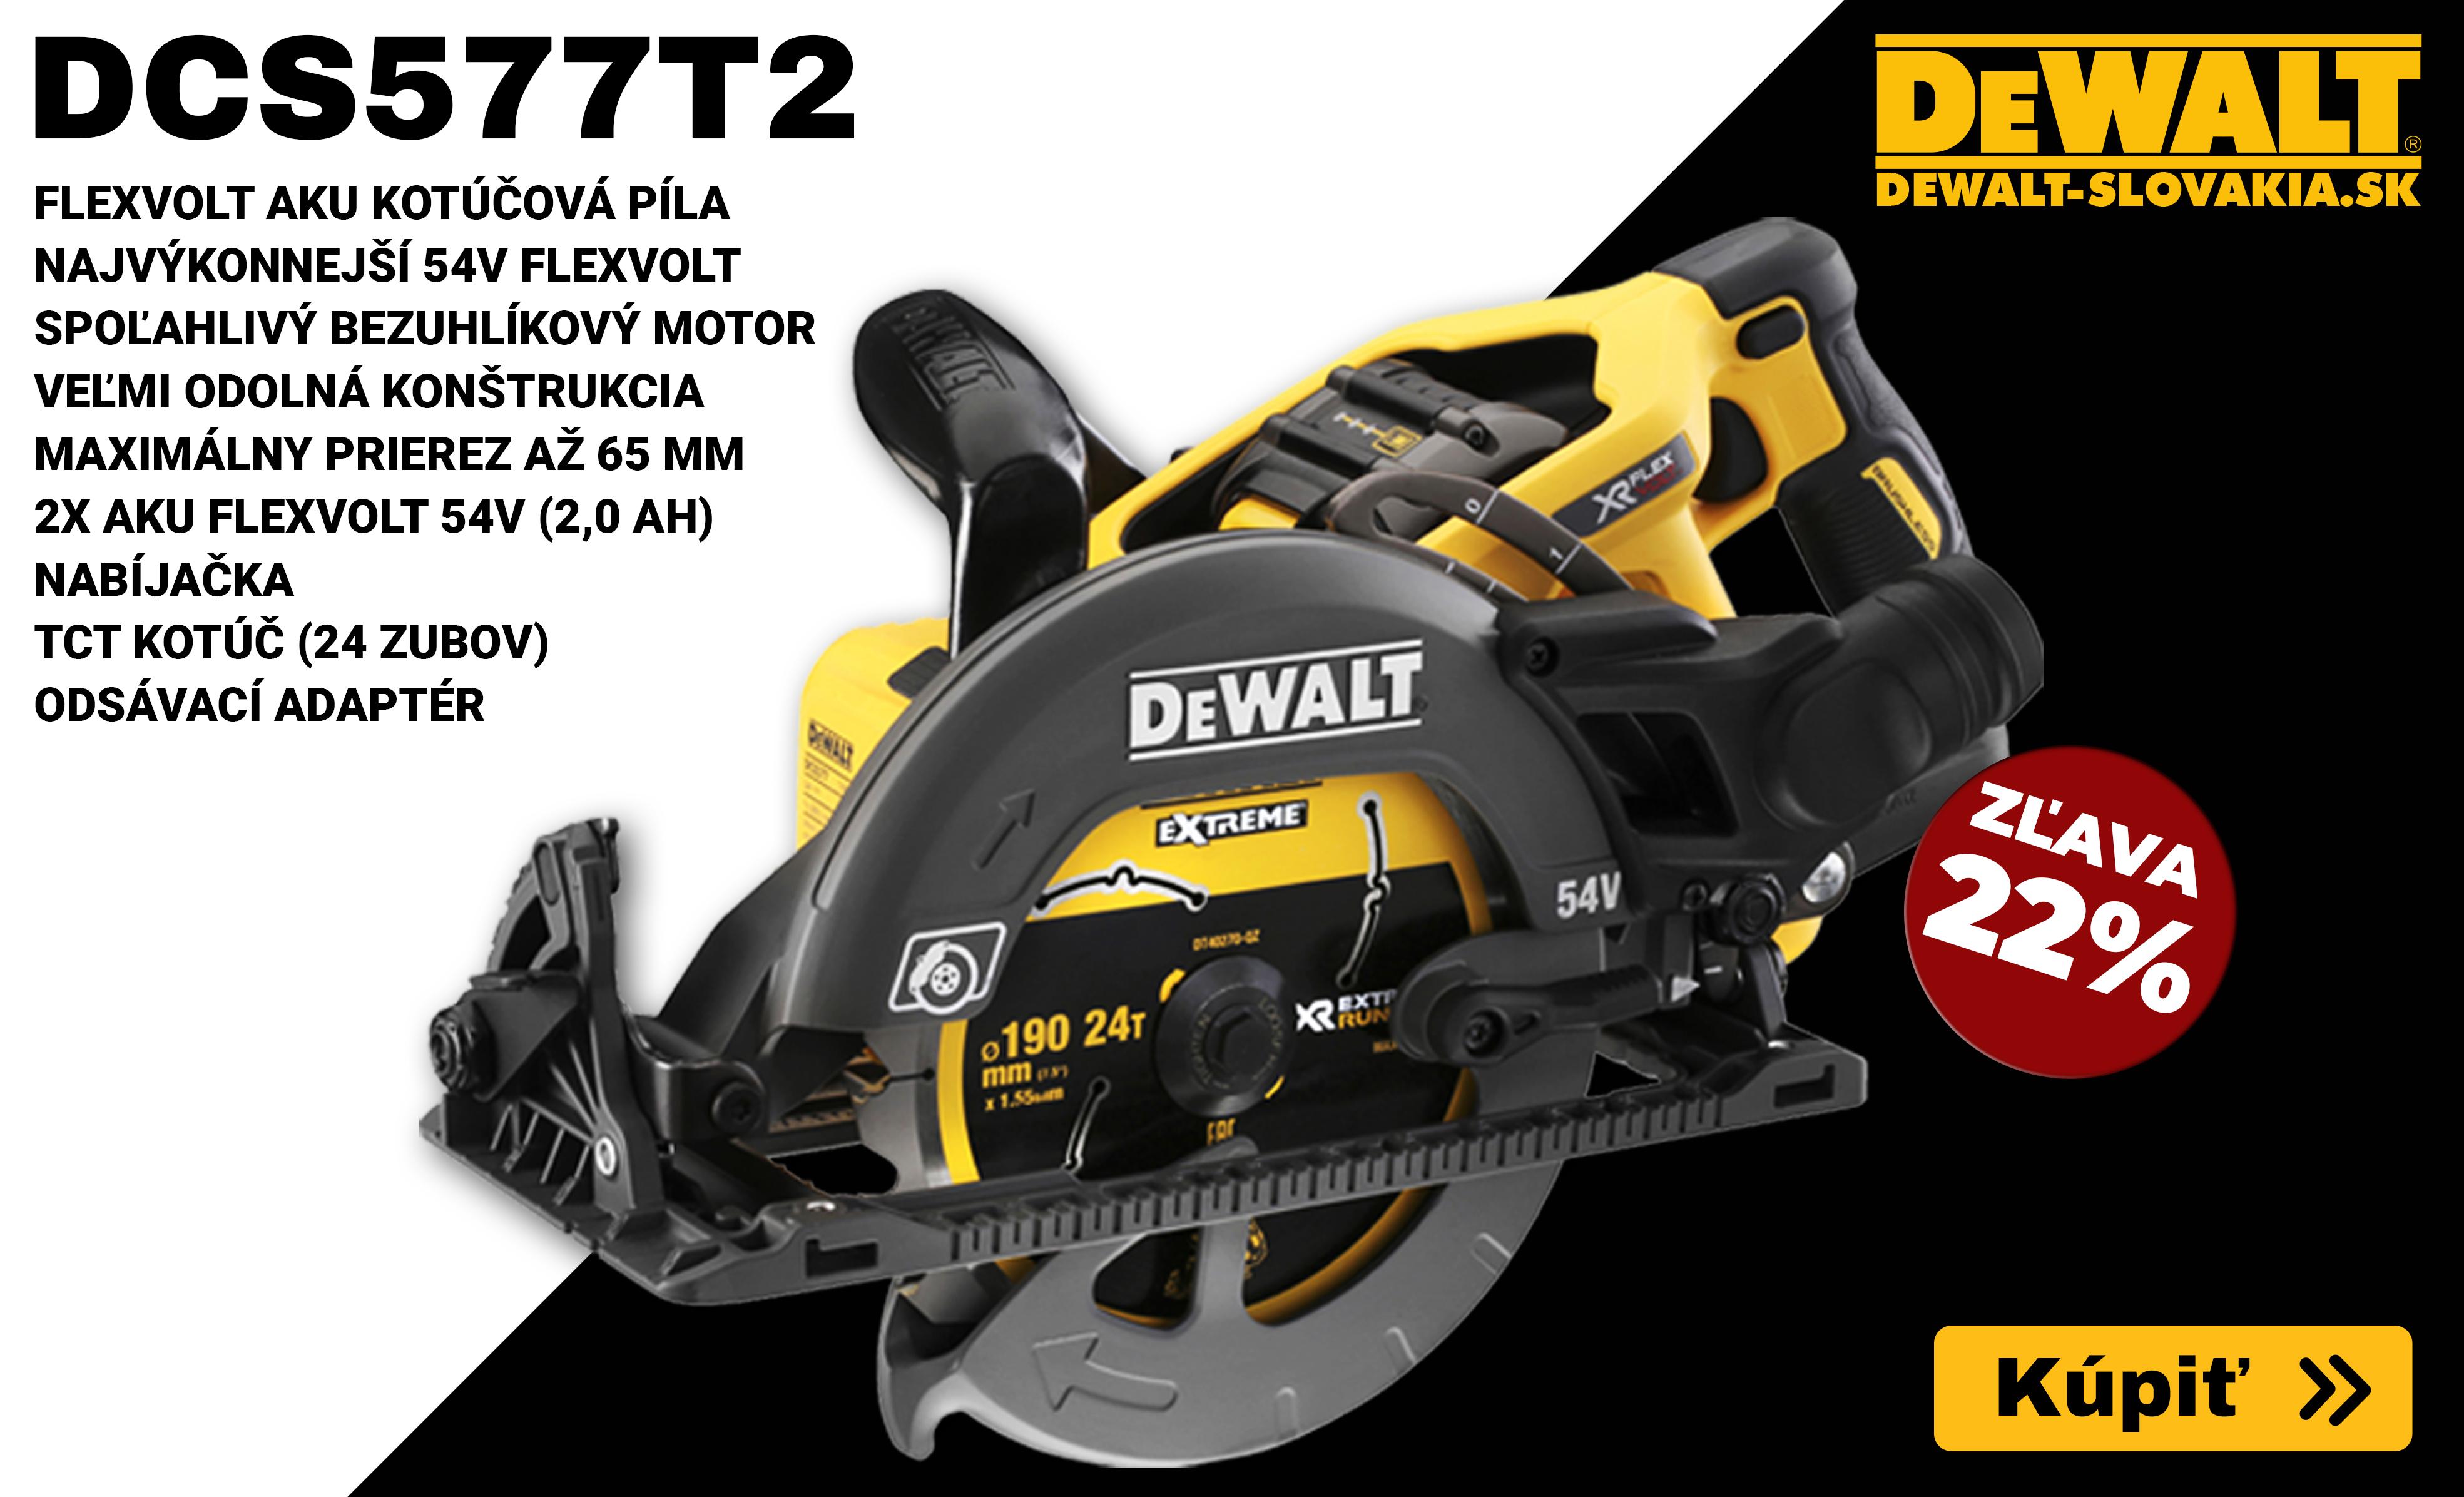 DCS577T2